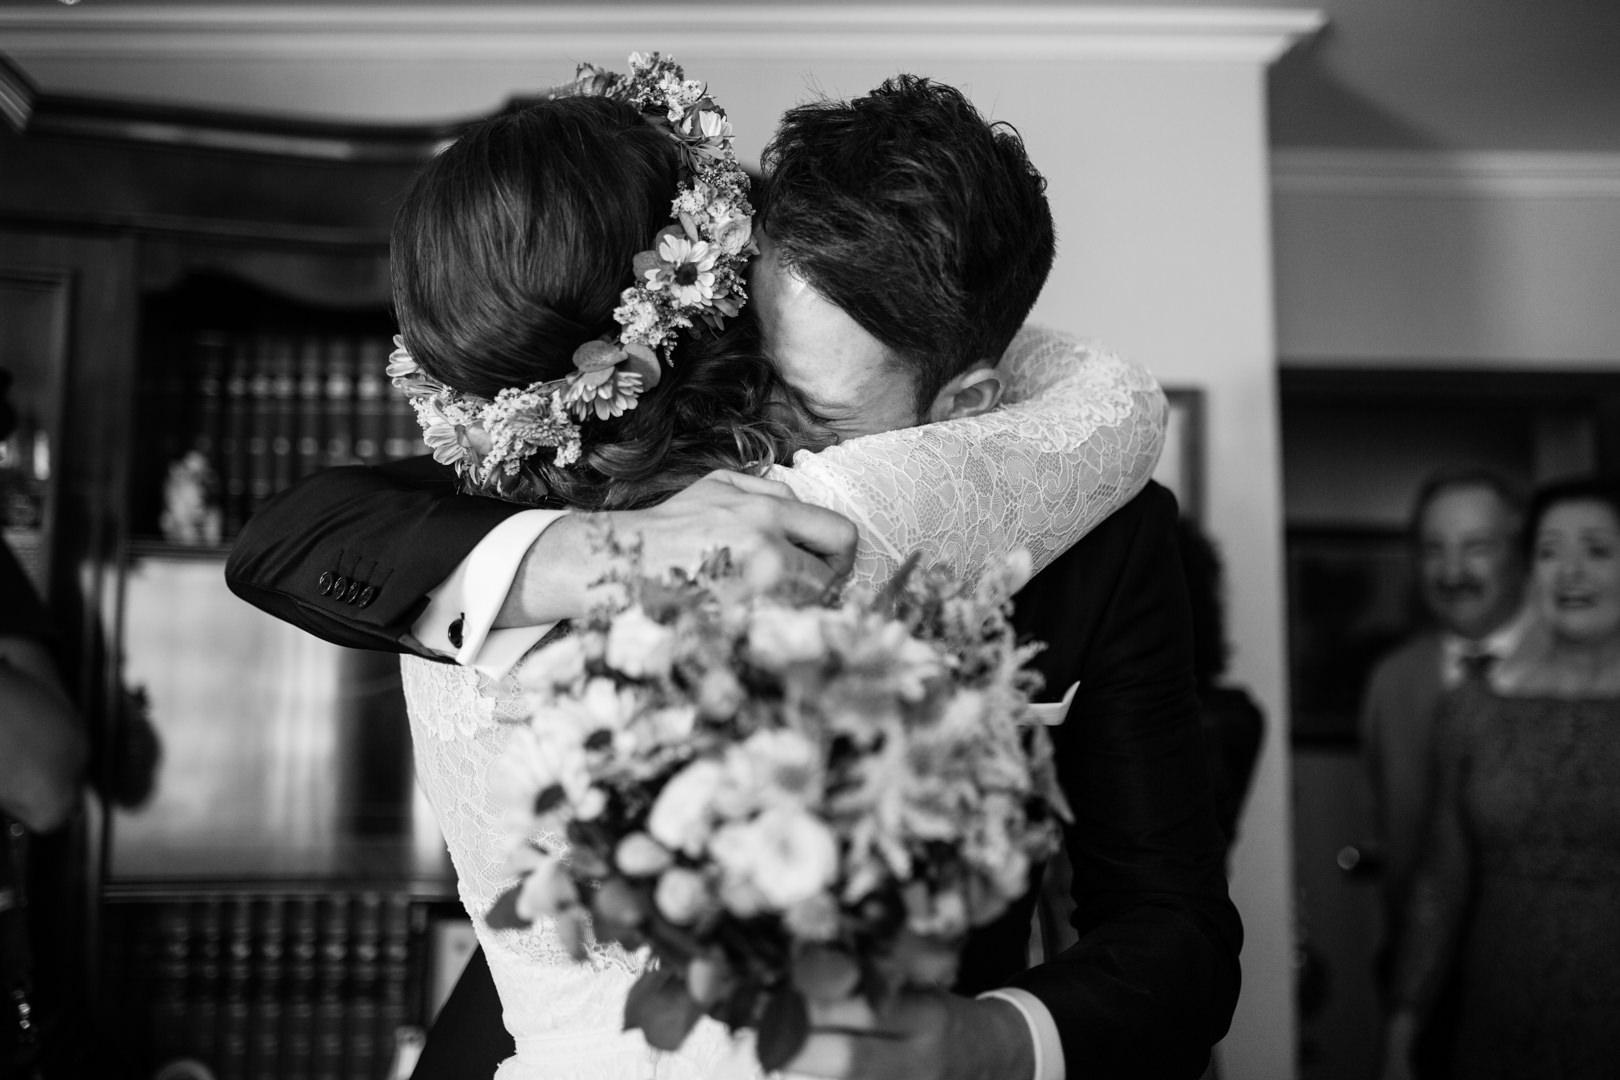 Boda-Lucia-Javi-Lugo-Rafael-Torres-fotografo-bodas-sevilla-madrid-barcelona-wedding-photographer--14.jpg